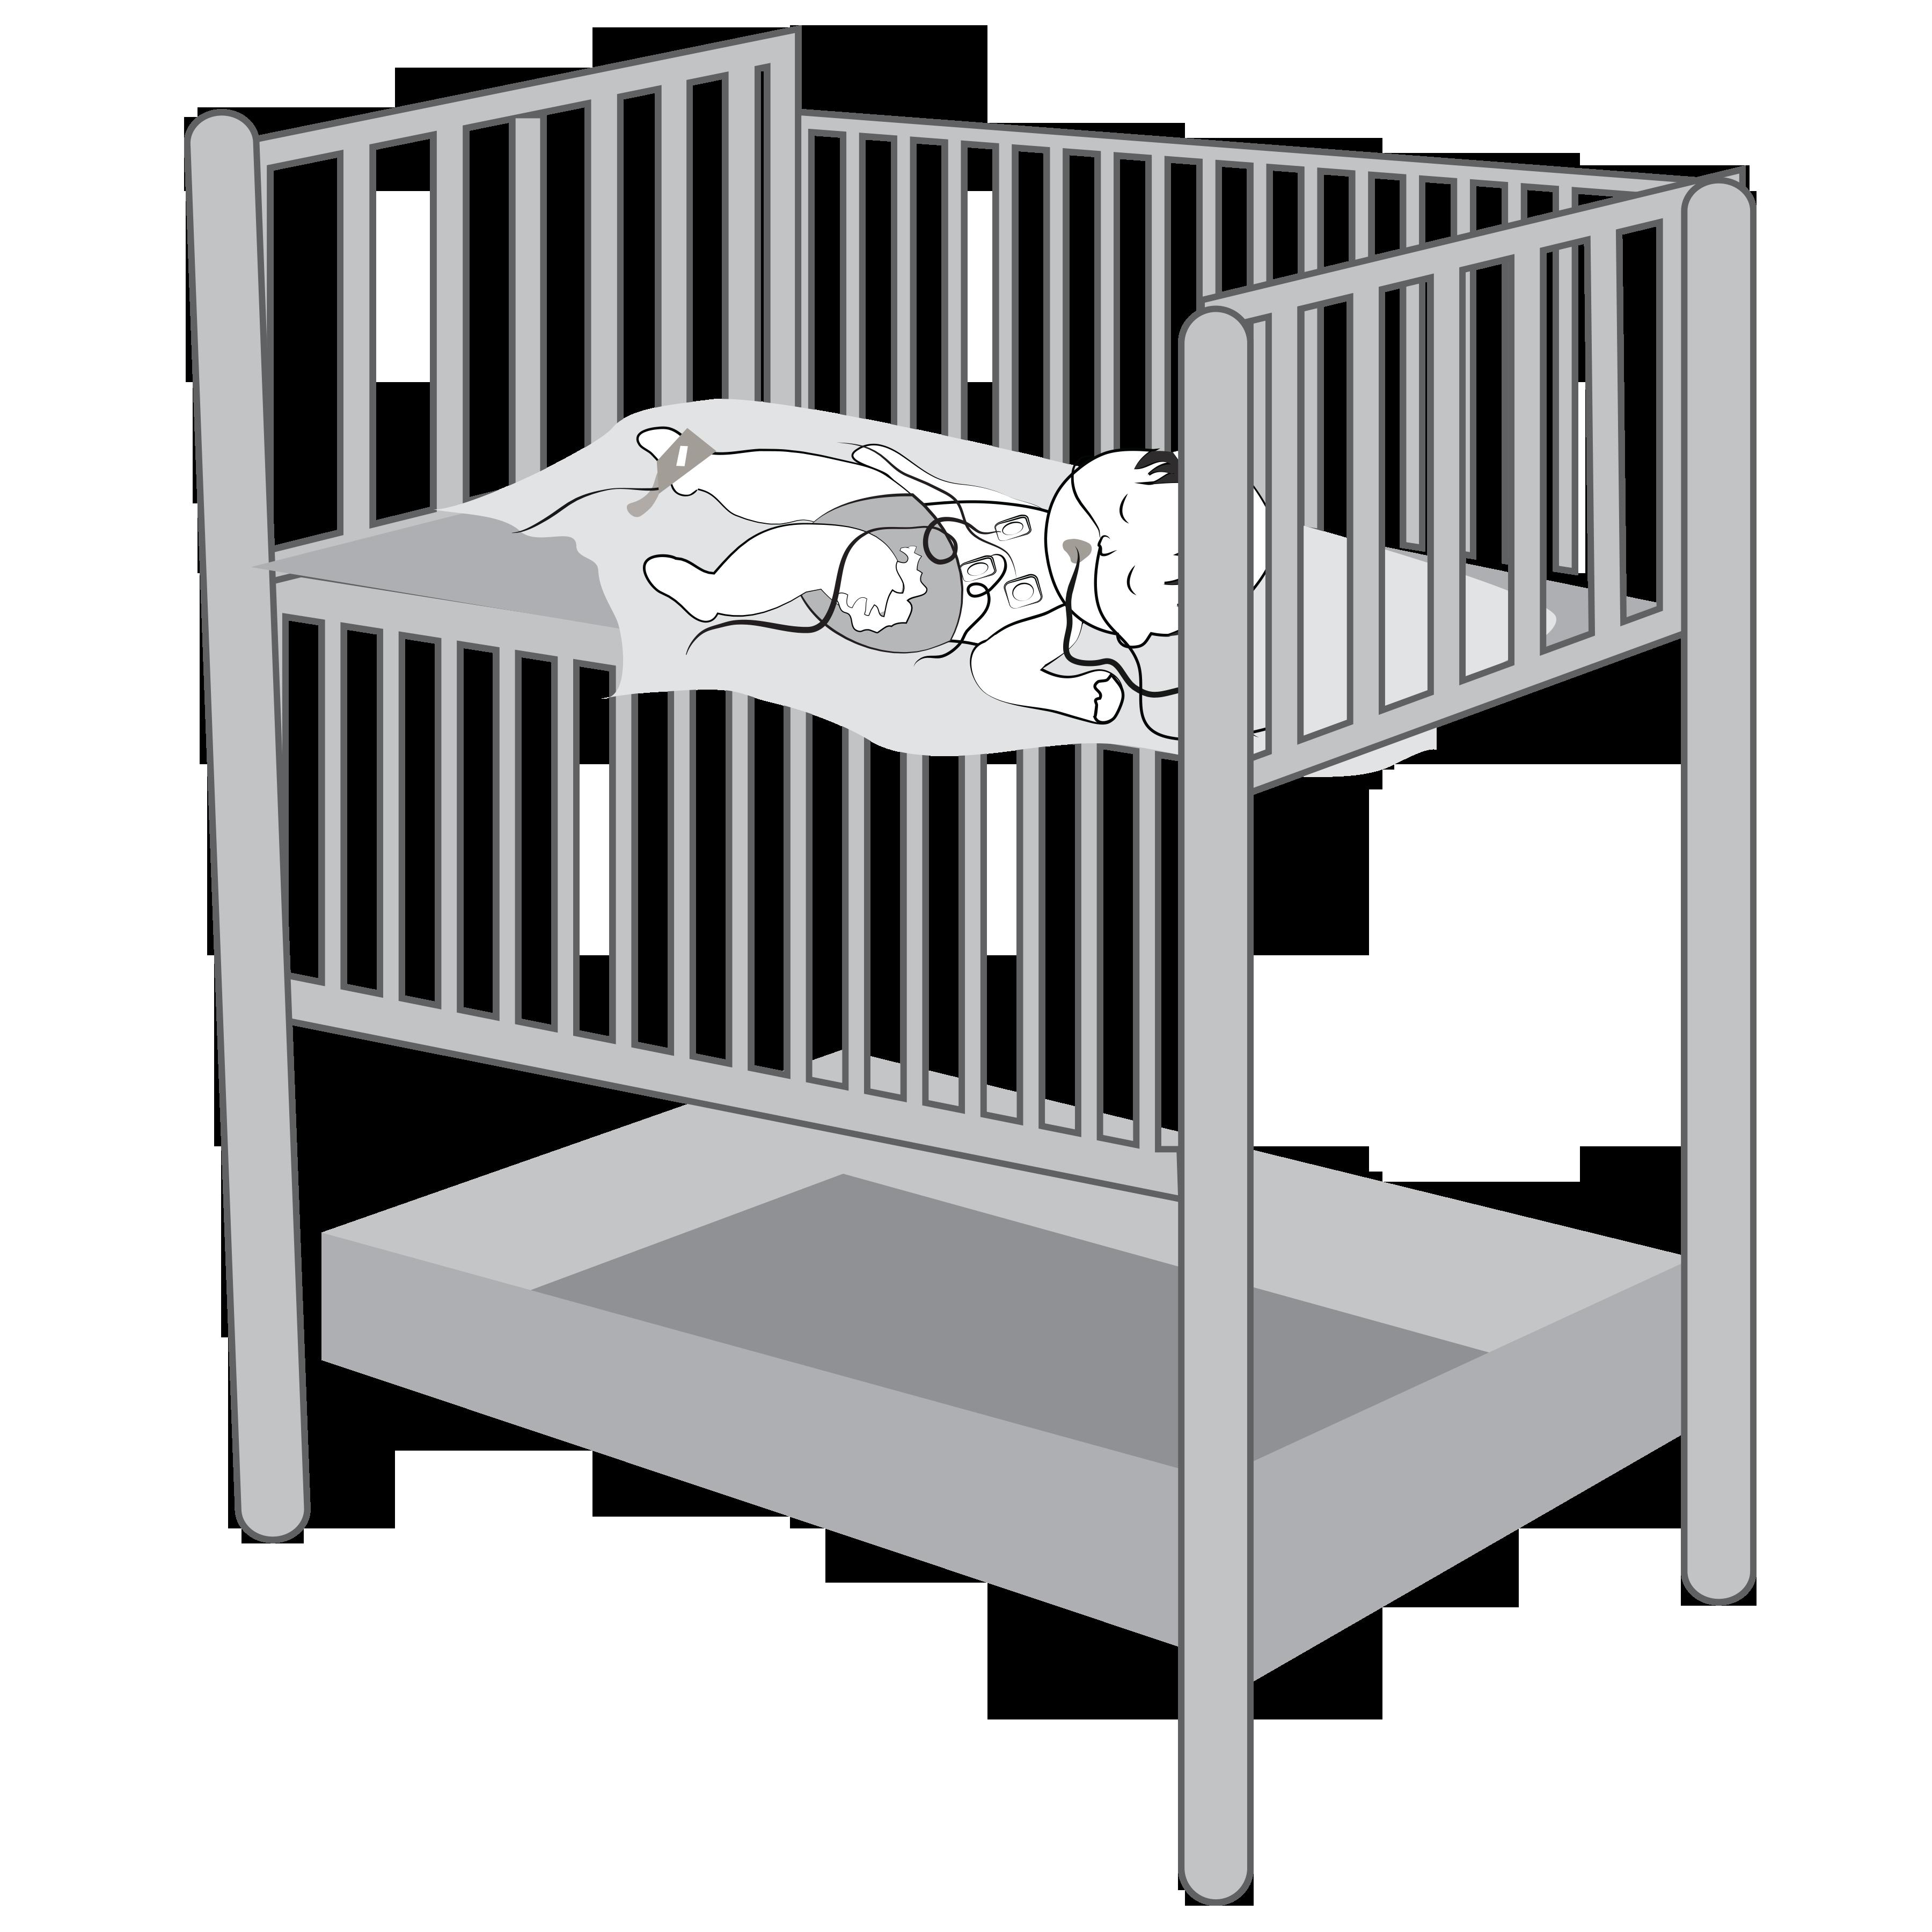 hospital-crib